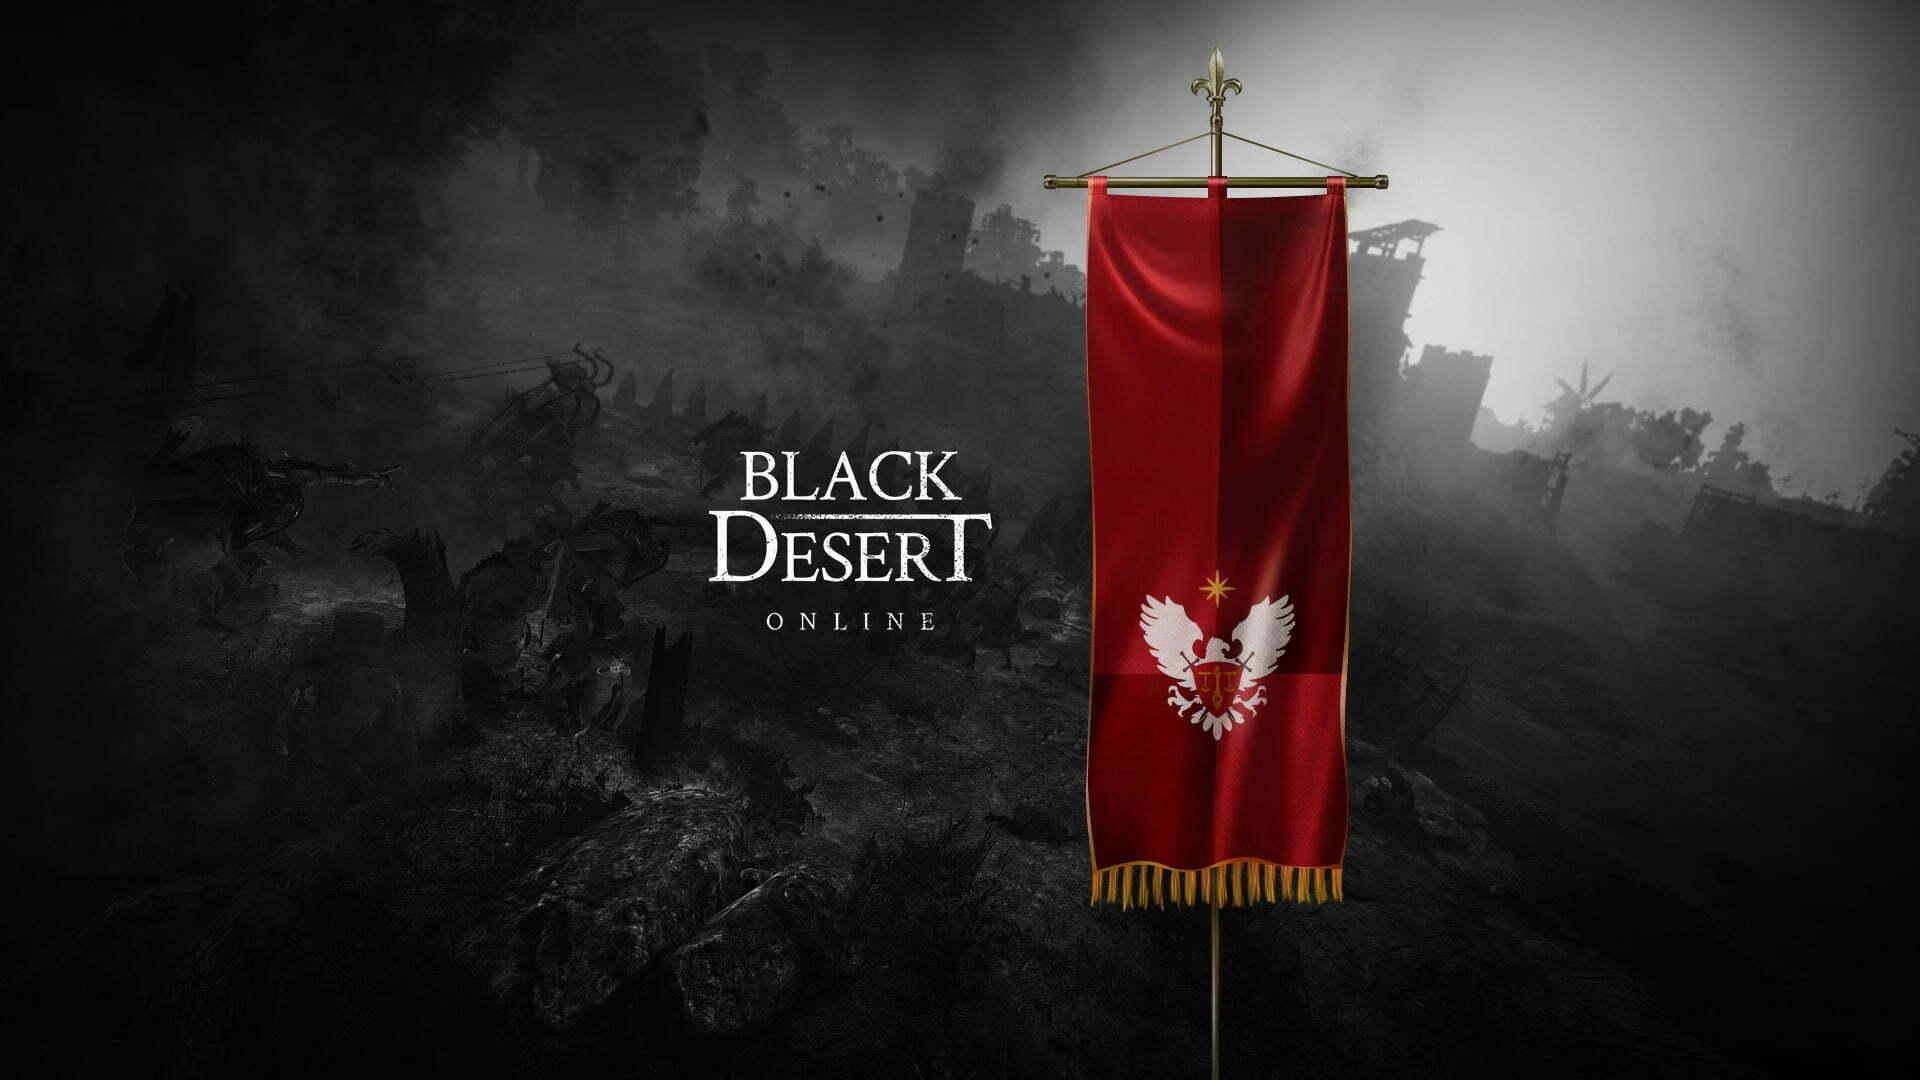 Lanzamiento oficial de Black Desert Online en Latinoamérica